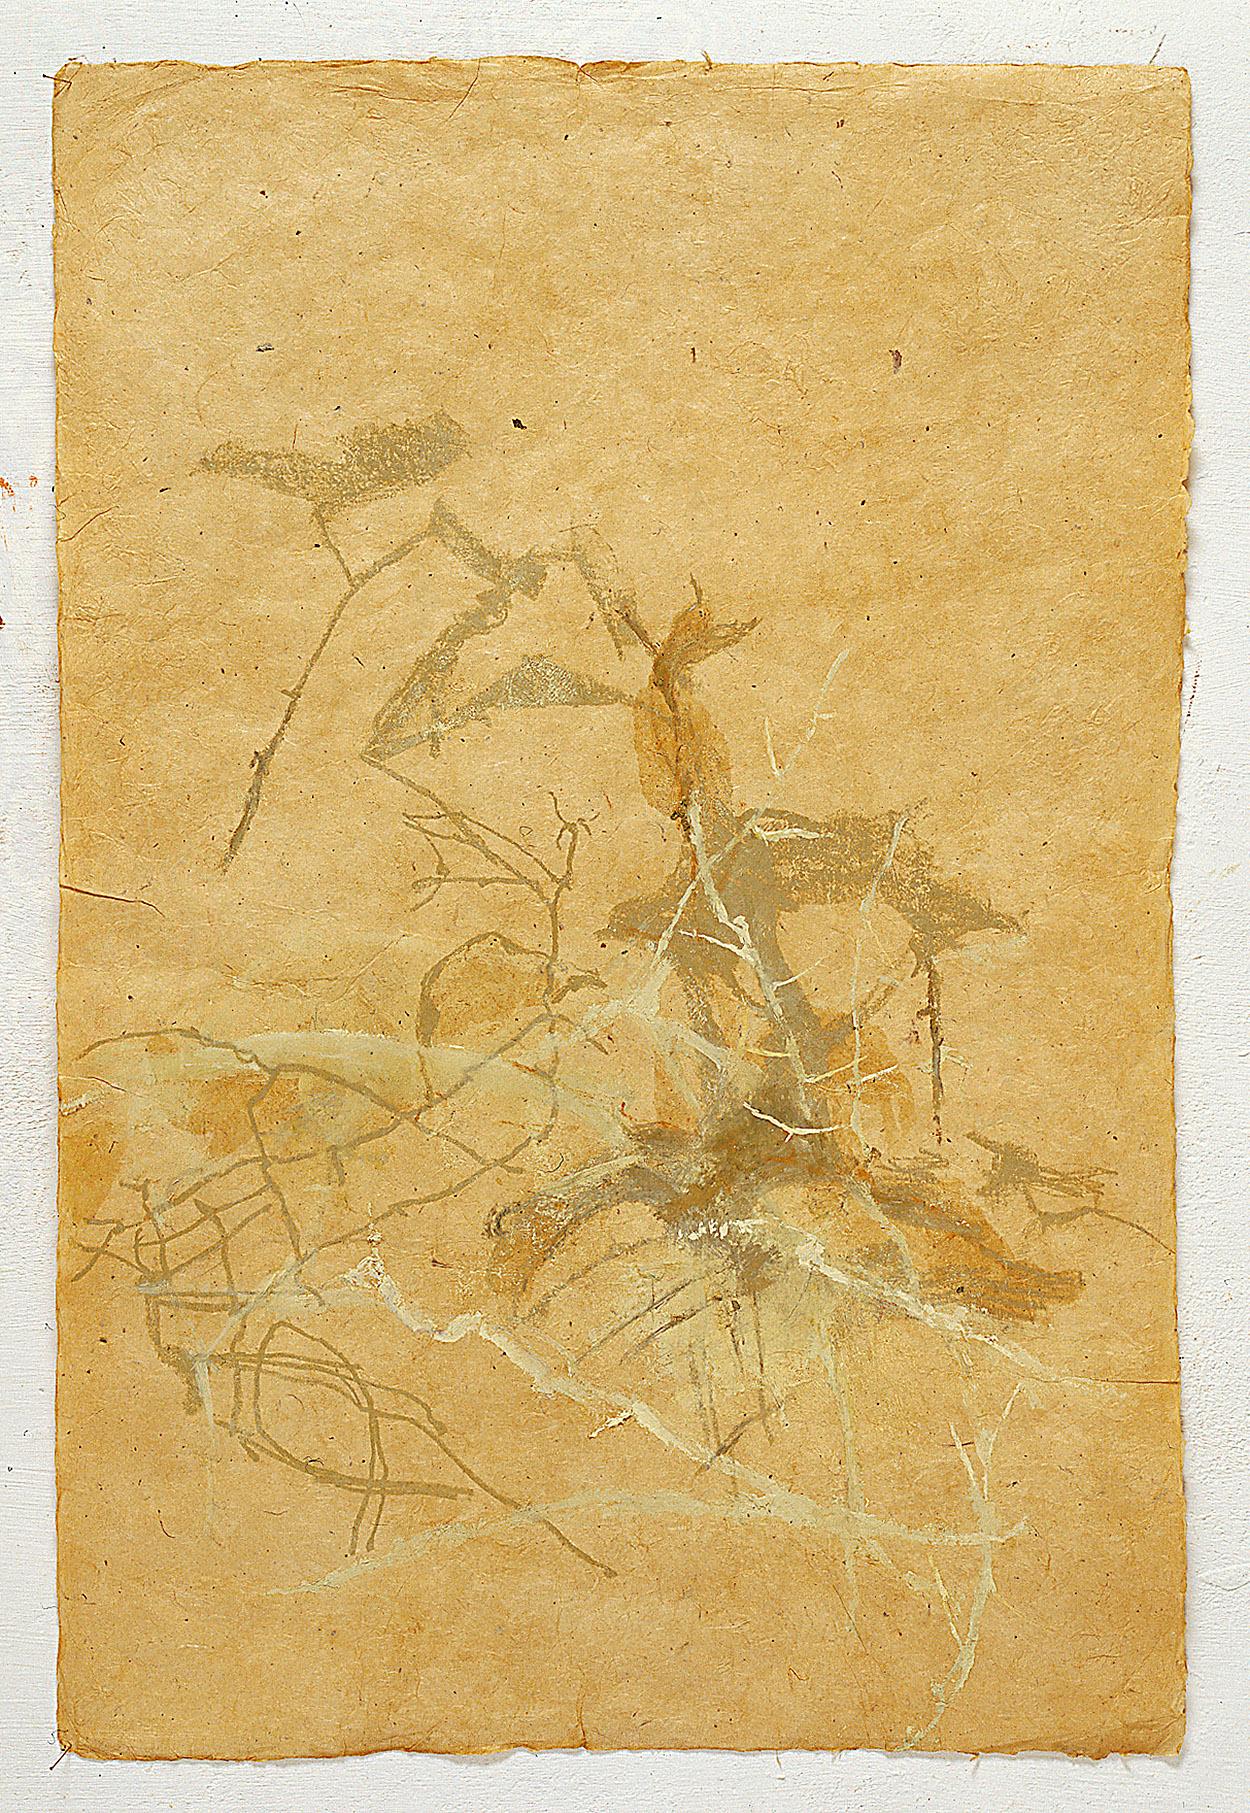 De un árbol   Oil paint on hand made nepalí paper. 51,5 x 76,5 cm.